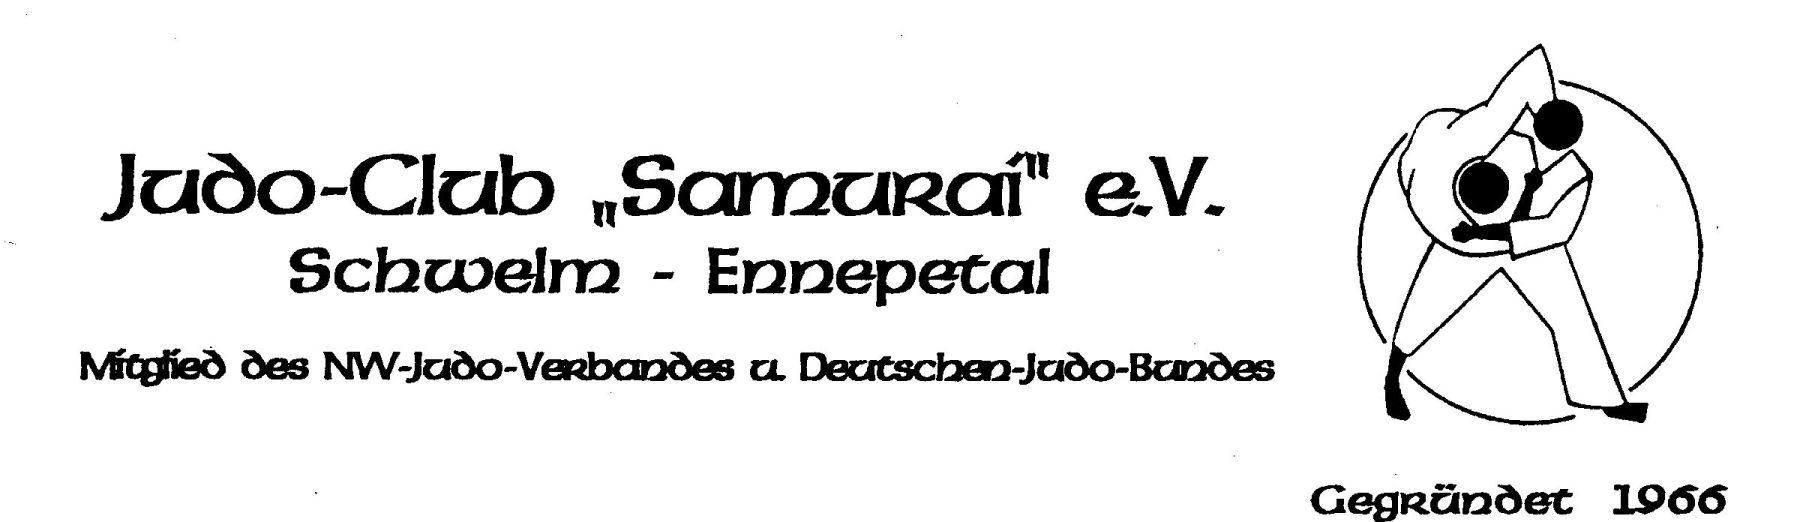 Samurai Briefkopf 75%